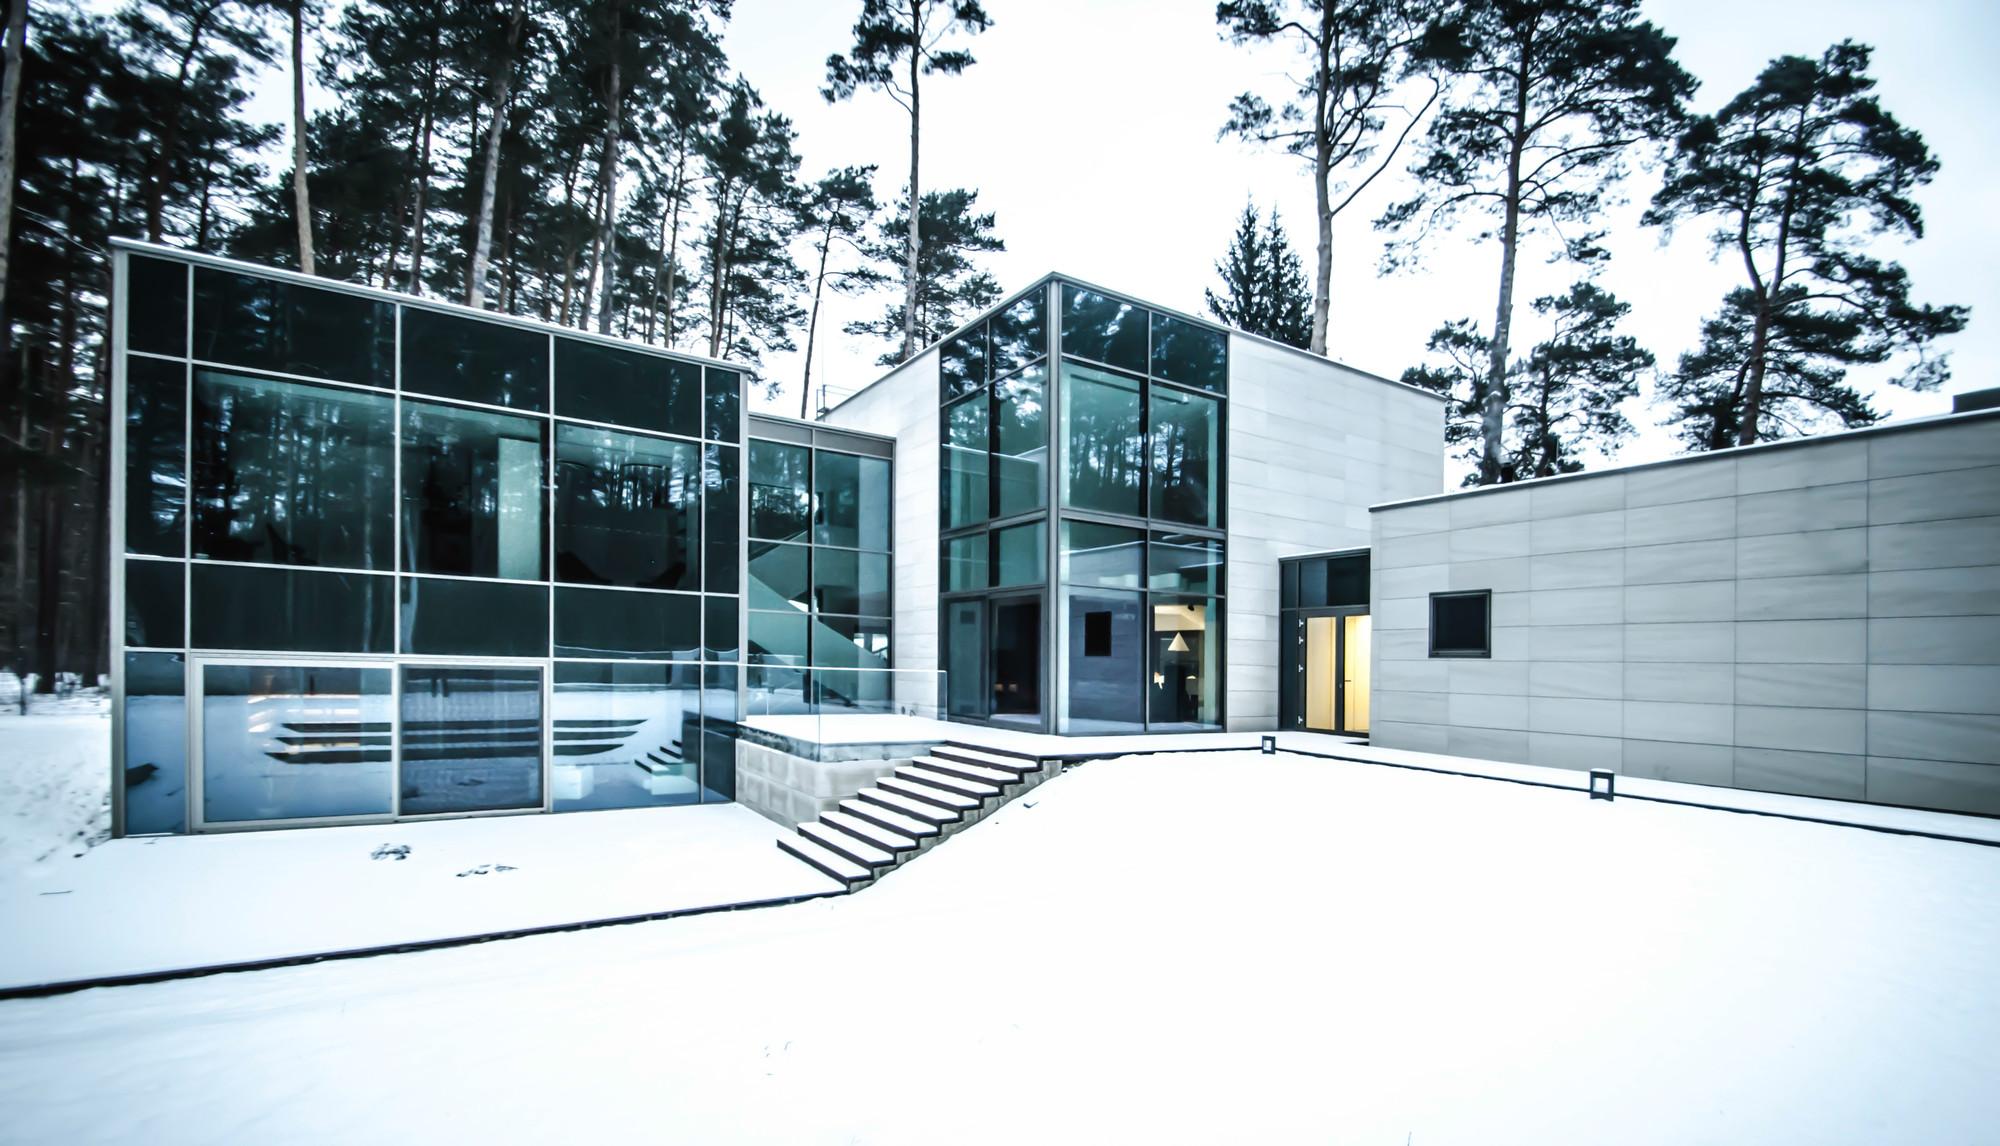 Parallelepiped Rectangle House / Devyni Architektai, © Arunas Skrolis